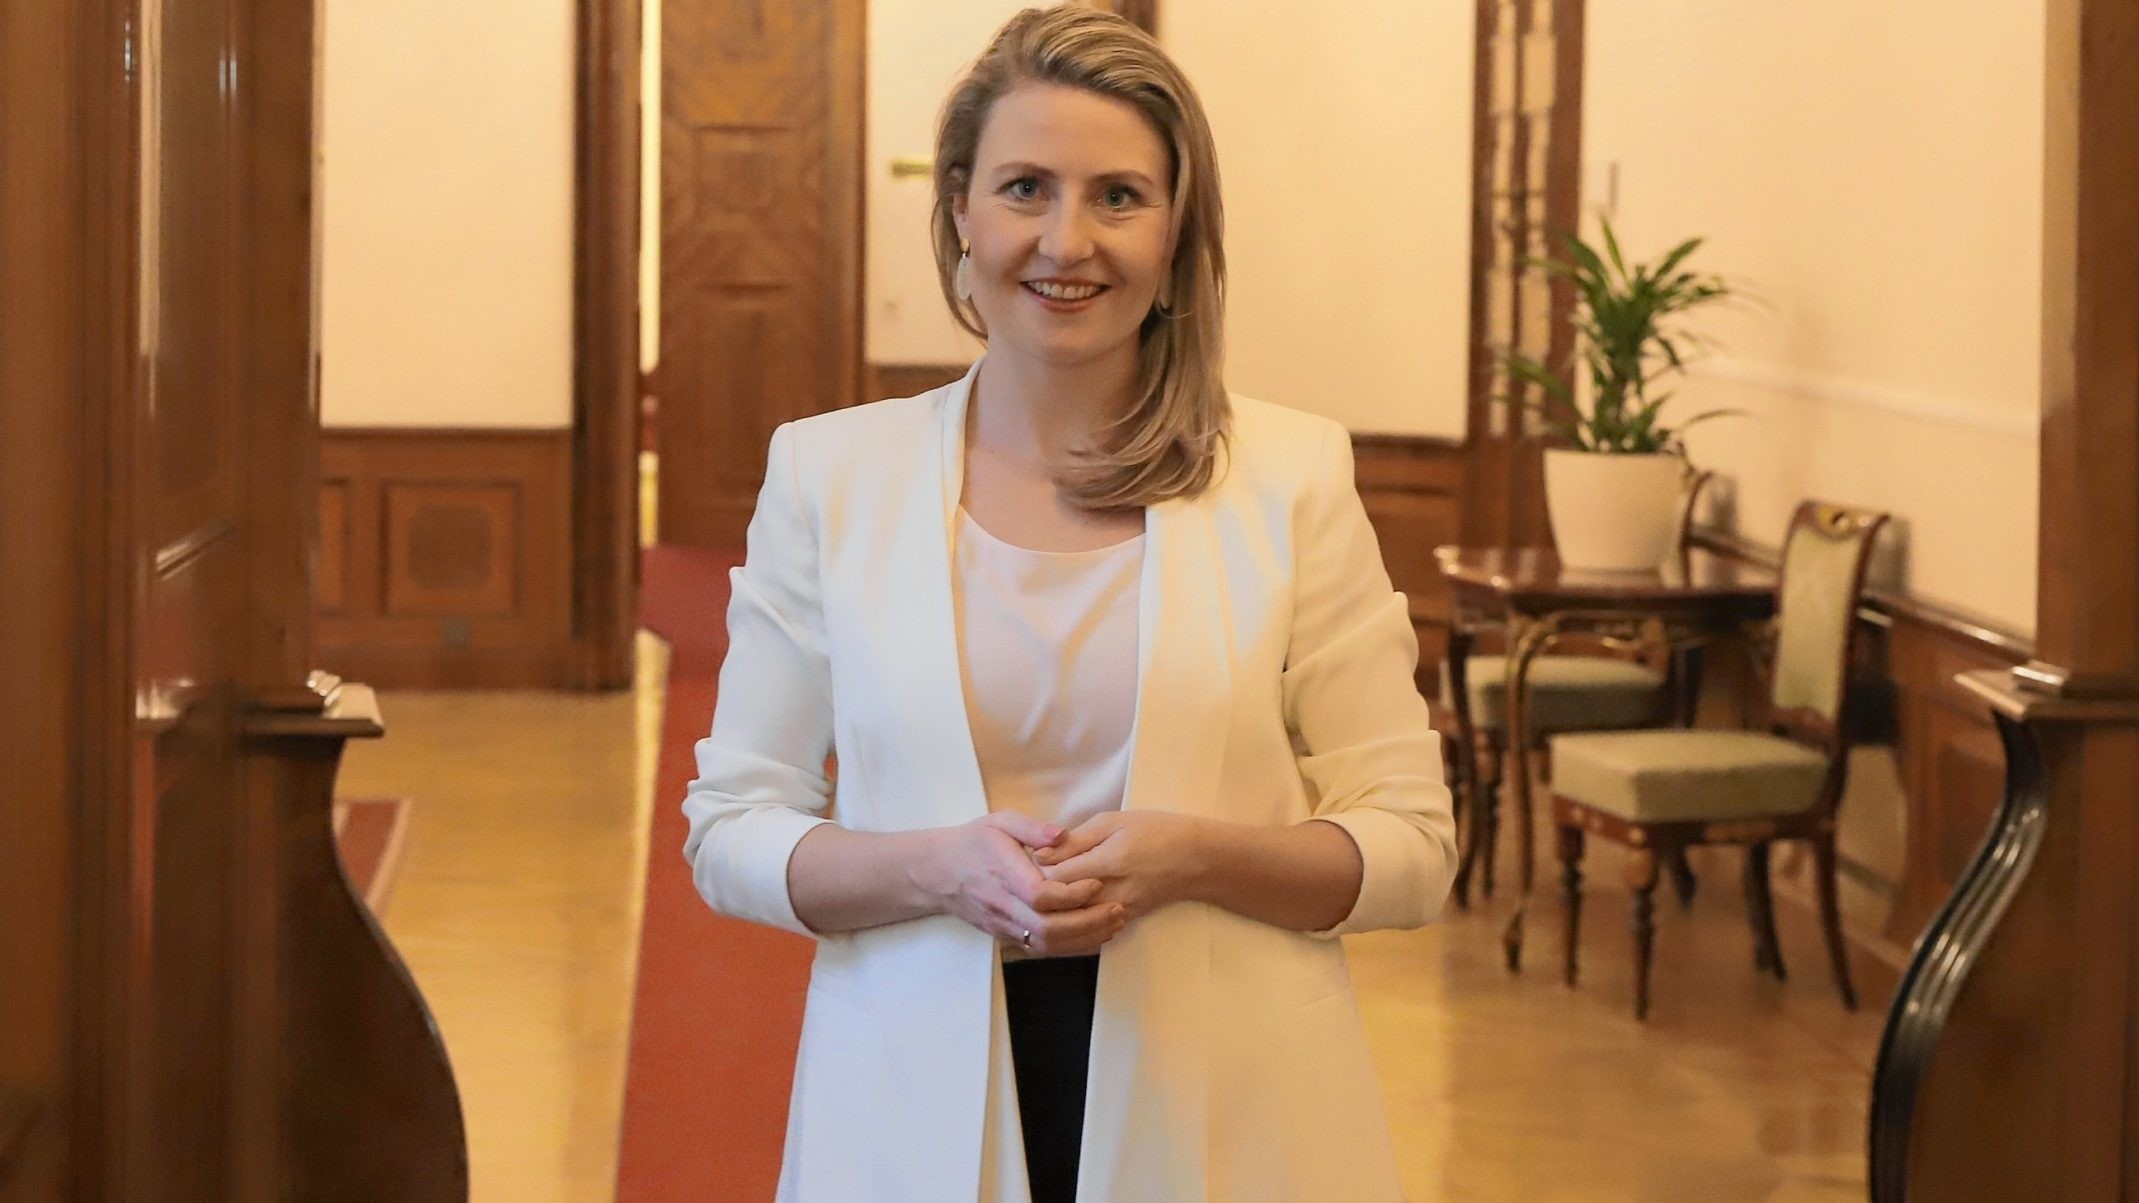 Frauentag - Dichtes Programm fr Ministerin Raab - comunidadelectronica.com